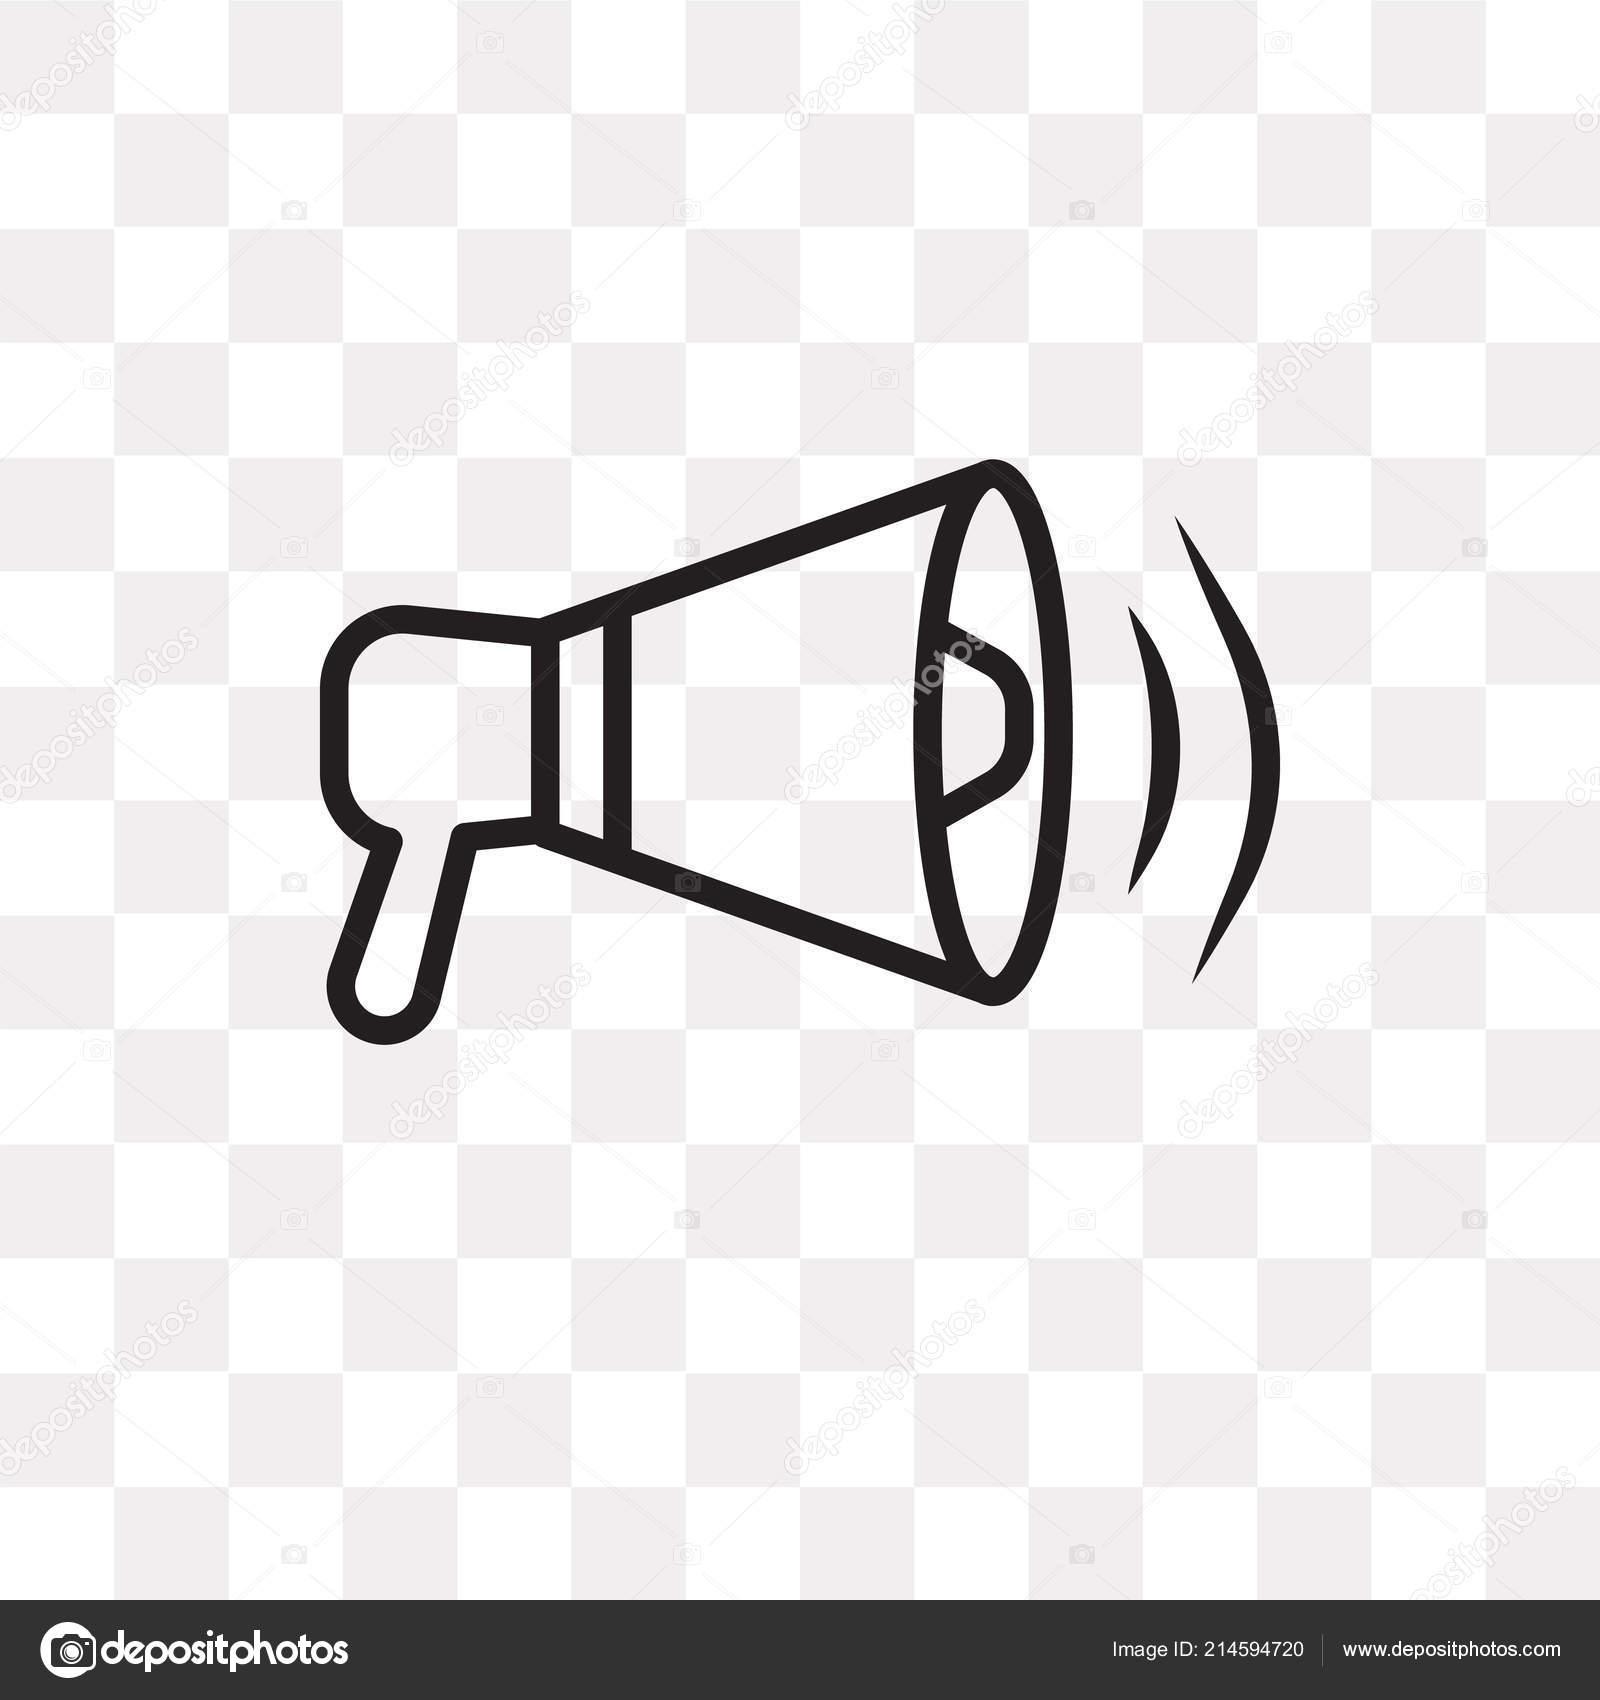 loudspeaker vector icon isolated transparent background loudspeaker logo concept stock vector c mmvector 214594720 https depositphotos com 214594720 stock illustration loudspeaker vector icon isolated transparent html